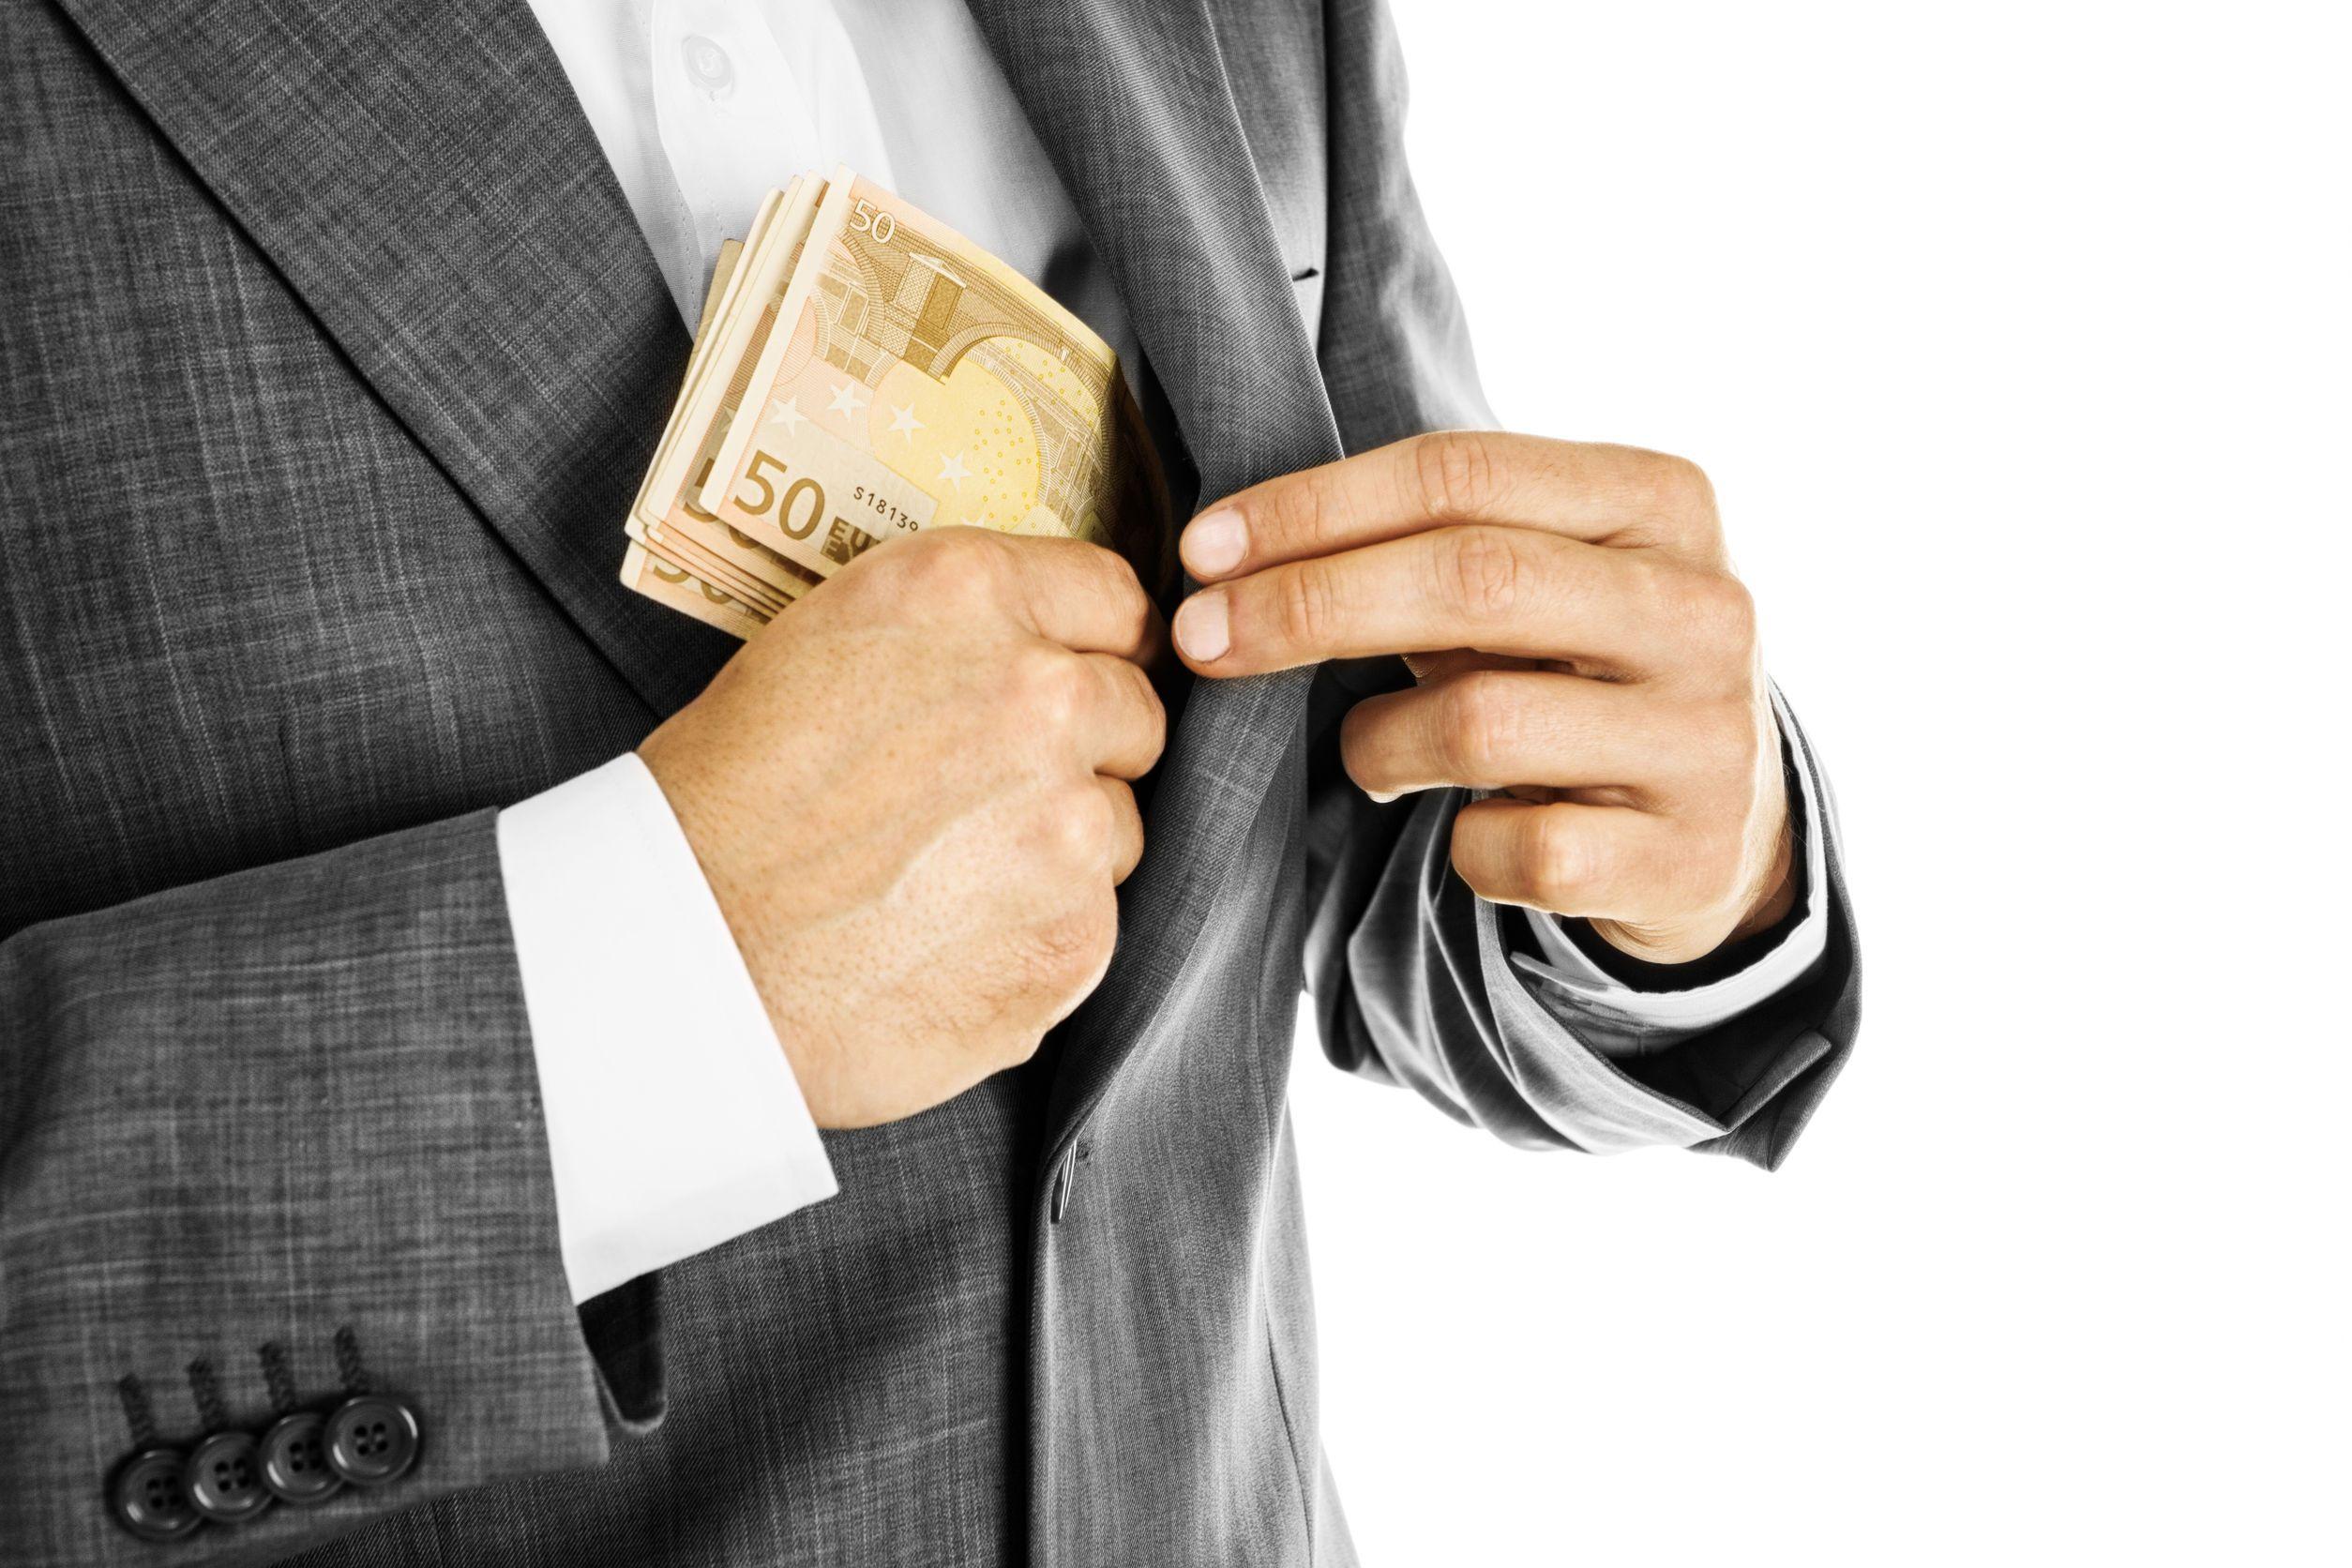 Extra Simplu iti ofera credit pana la salariu in conditii avantajoase.